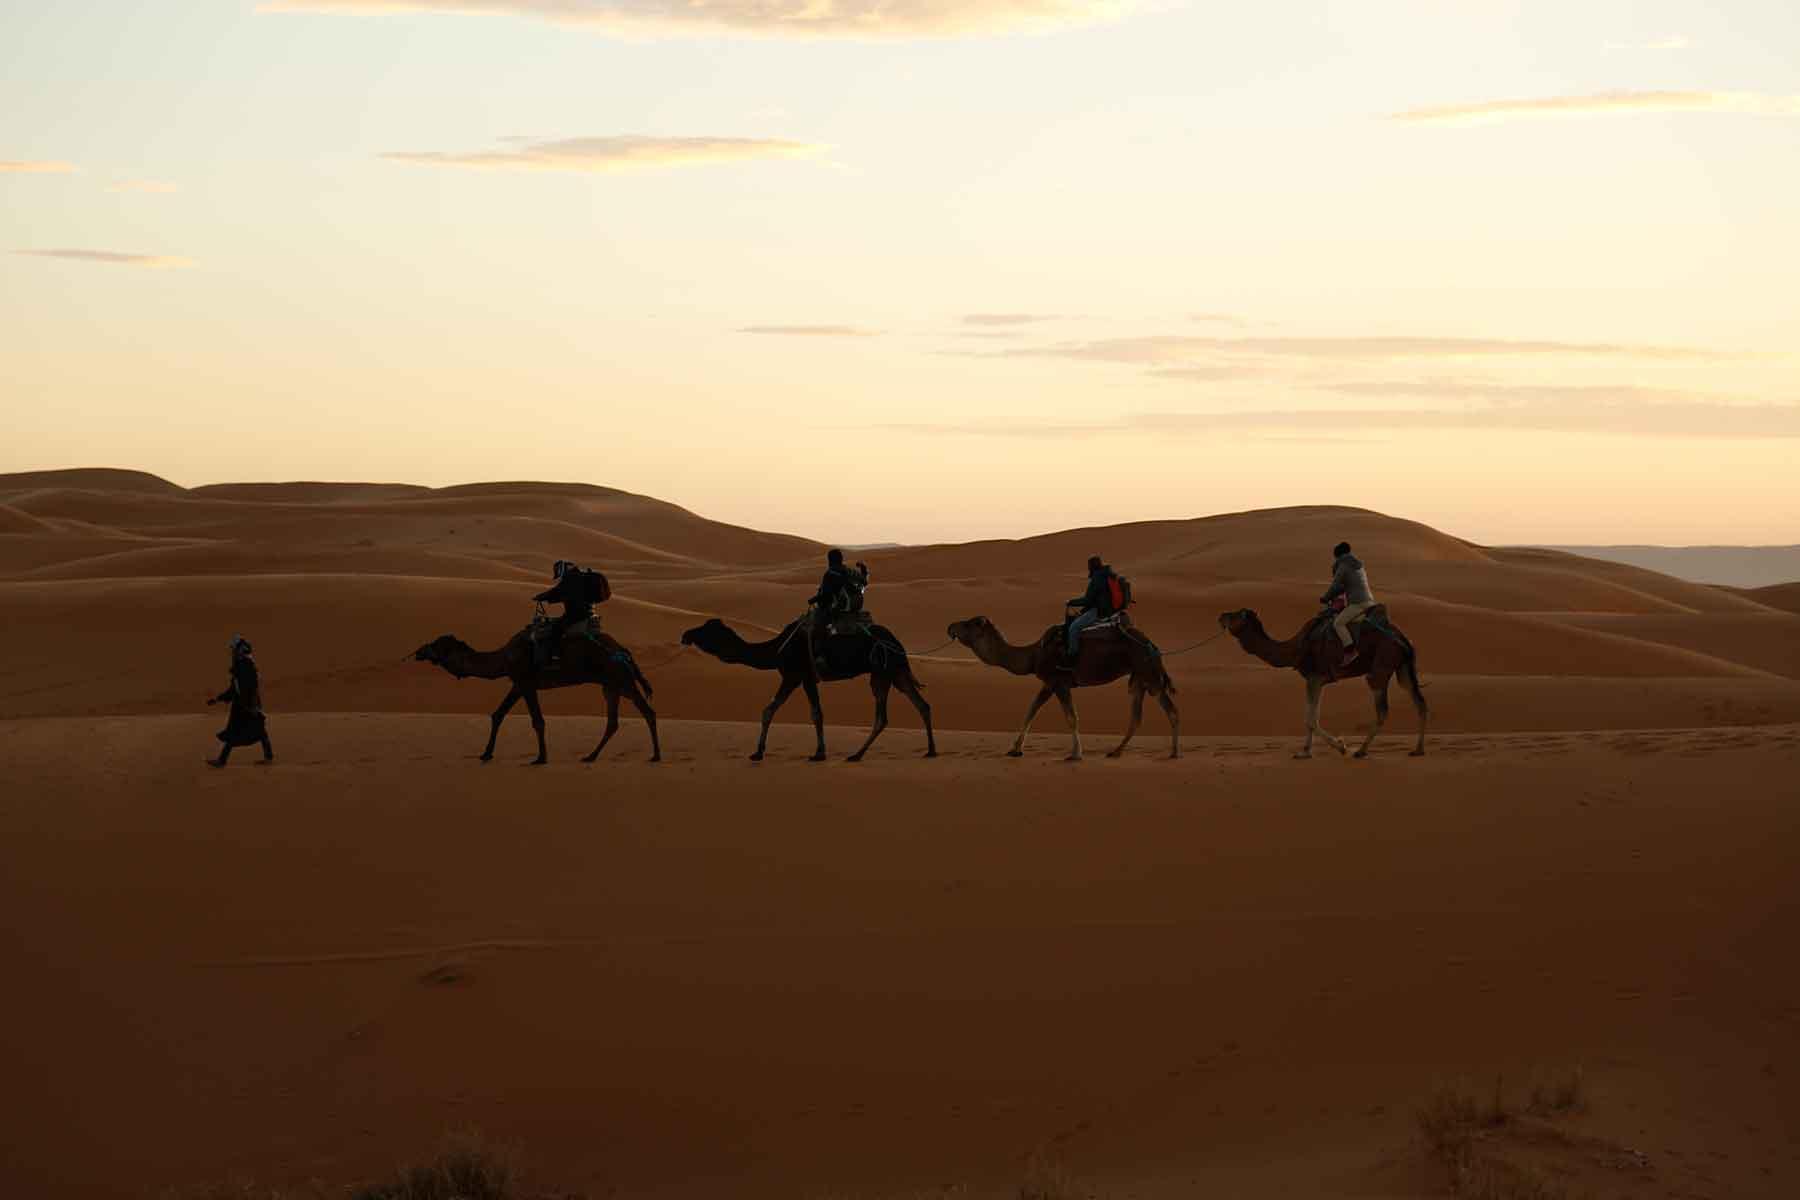 Morocco Sahara Desert Tours from Marrakech